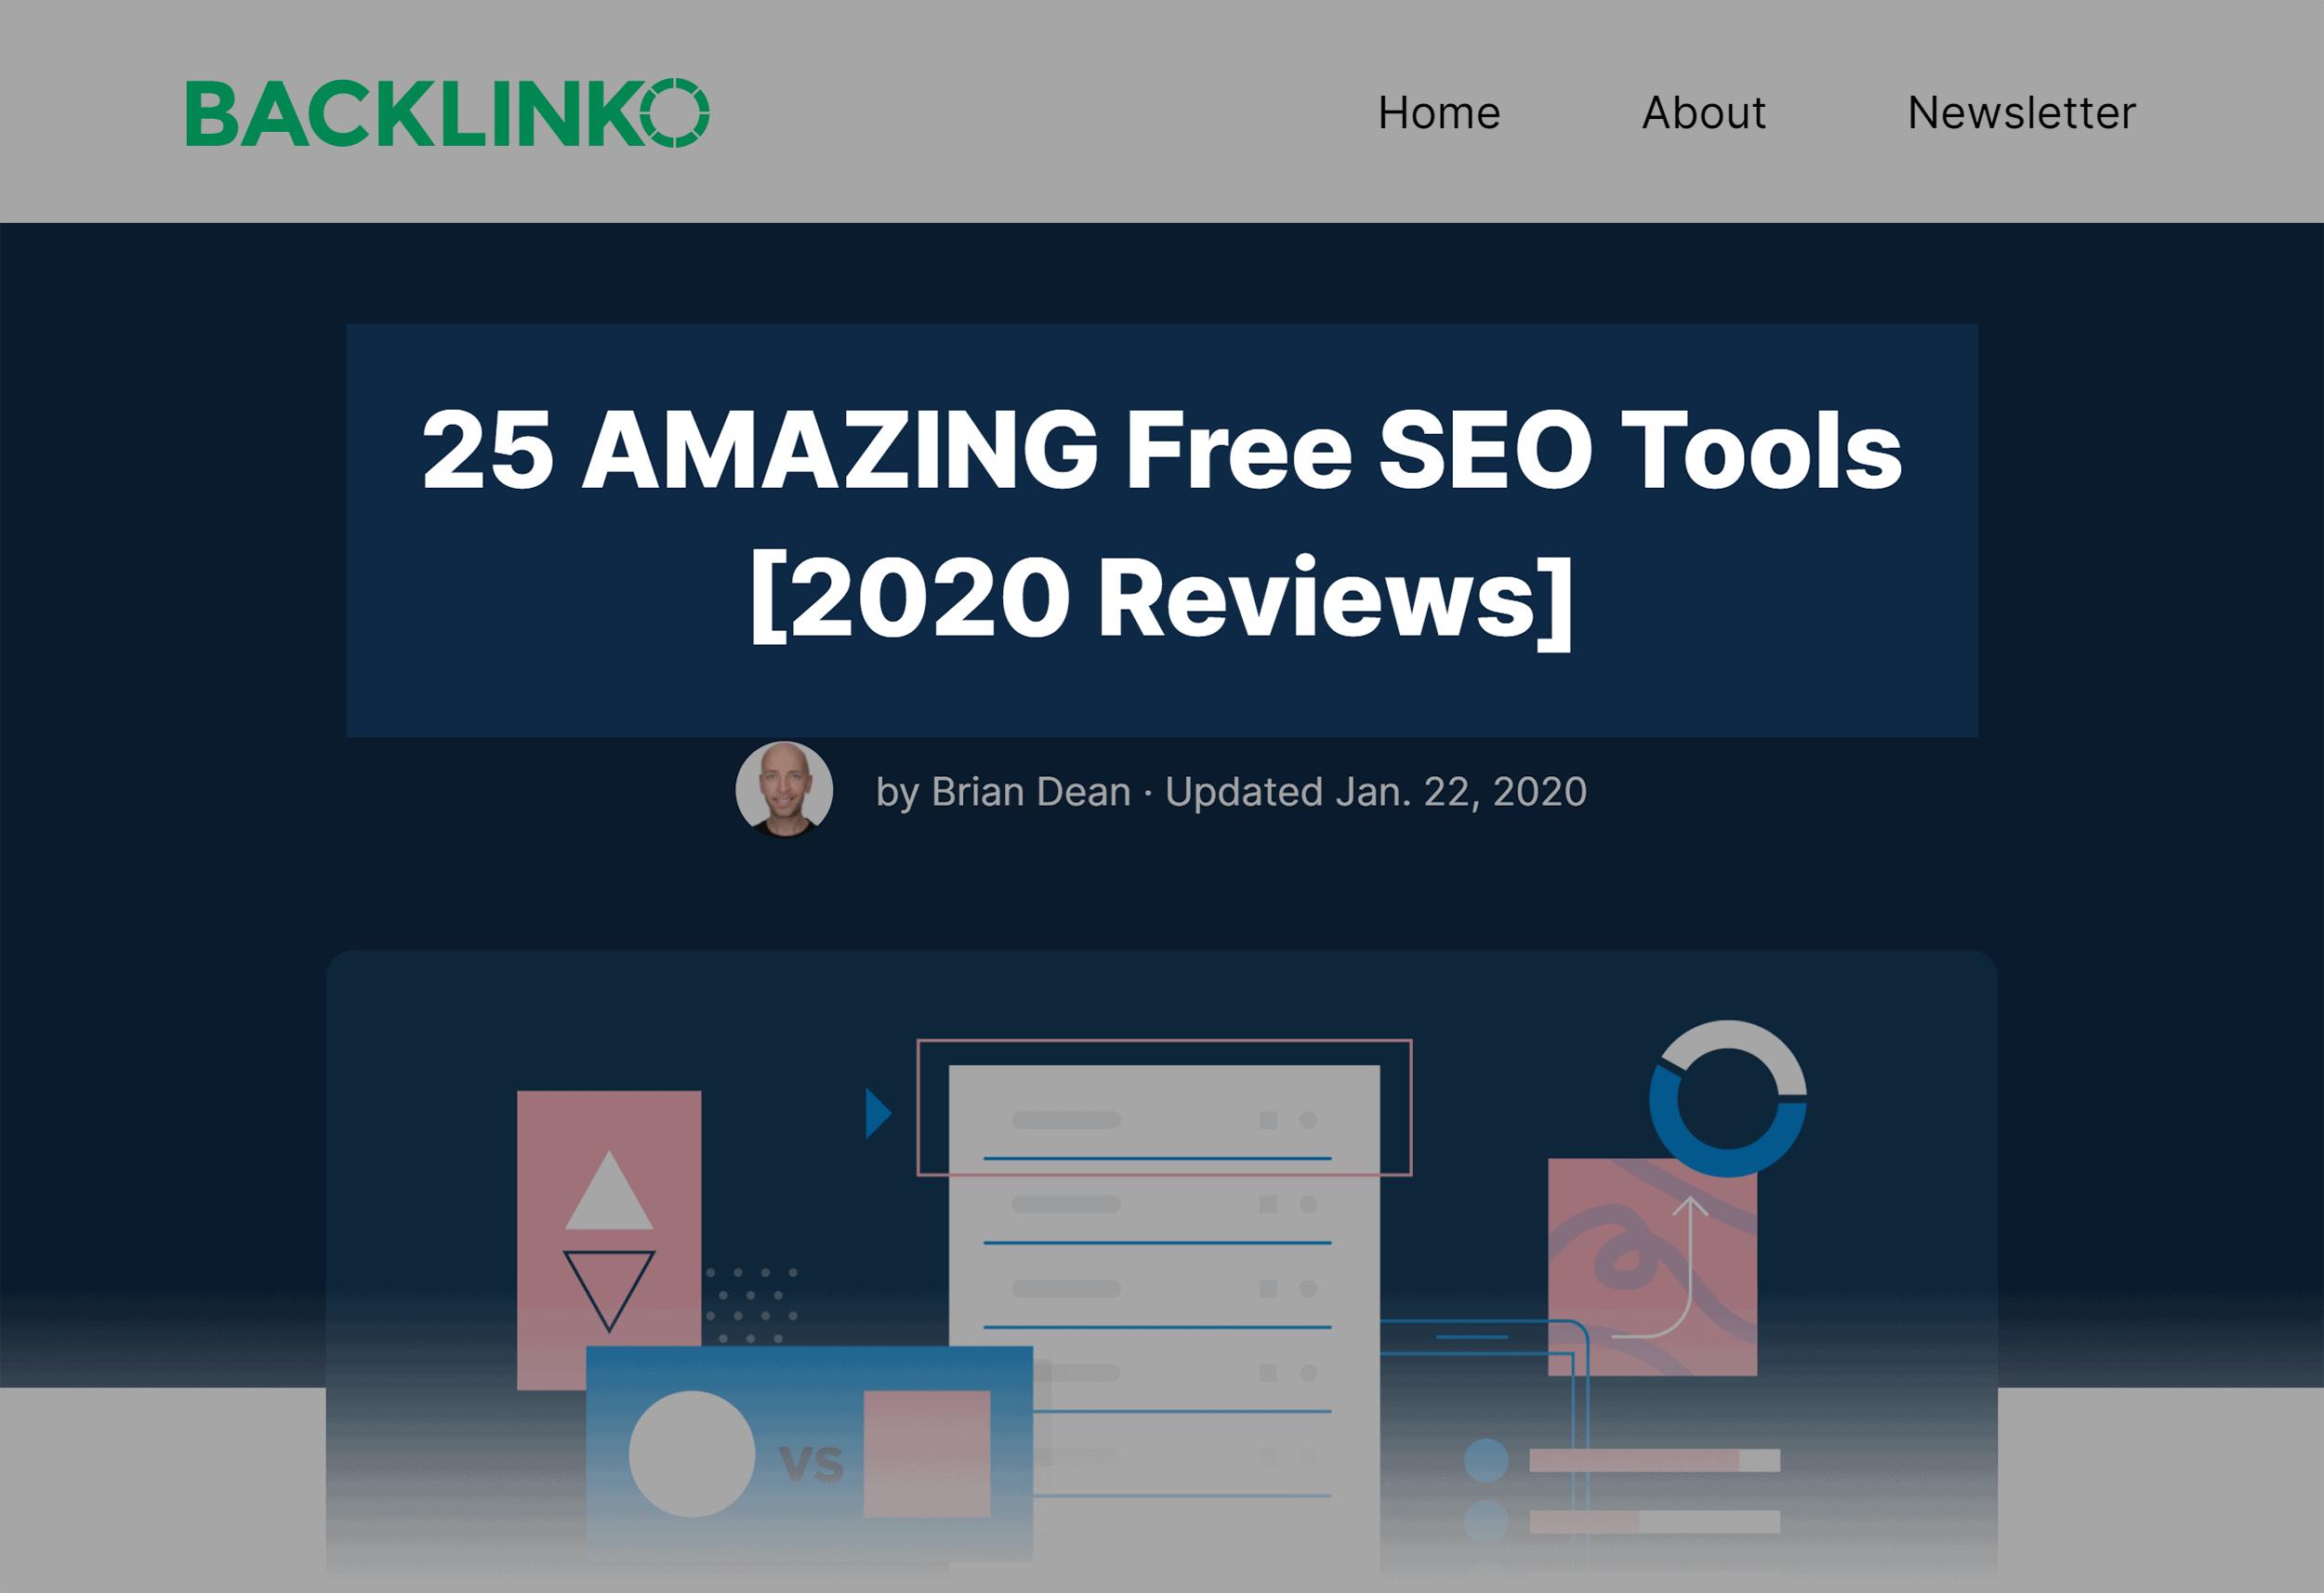 Backlinko - عنوان رایگان بهترین ابزارهای جستجوگرها رایگان